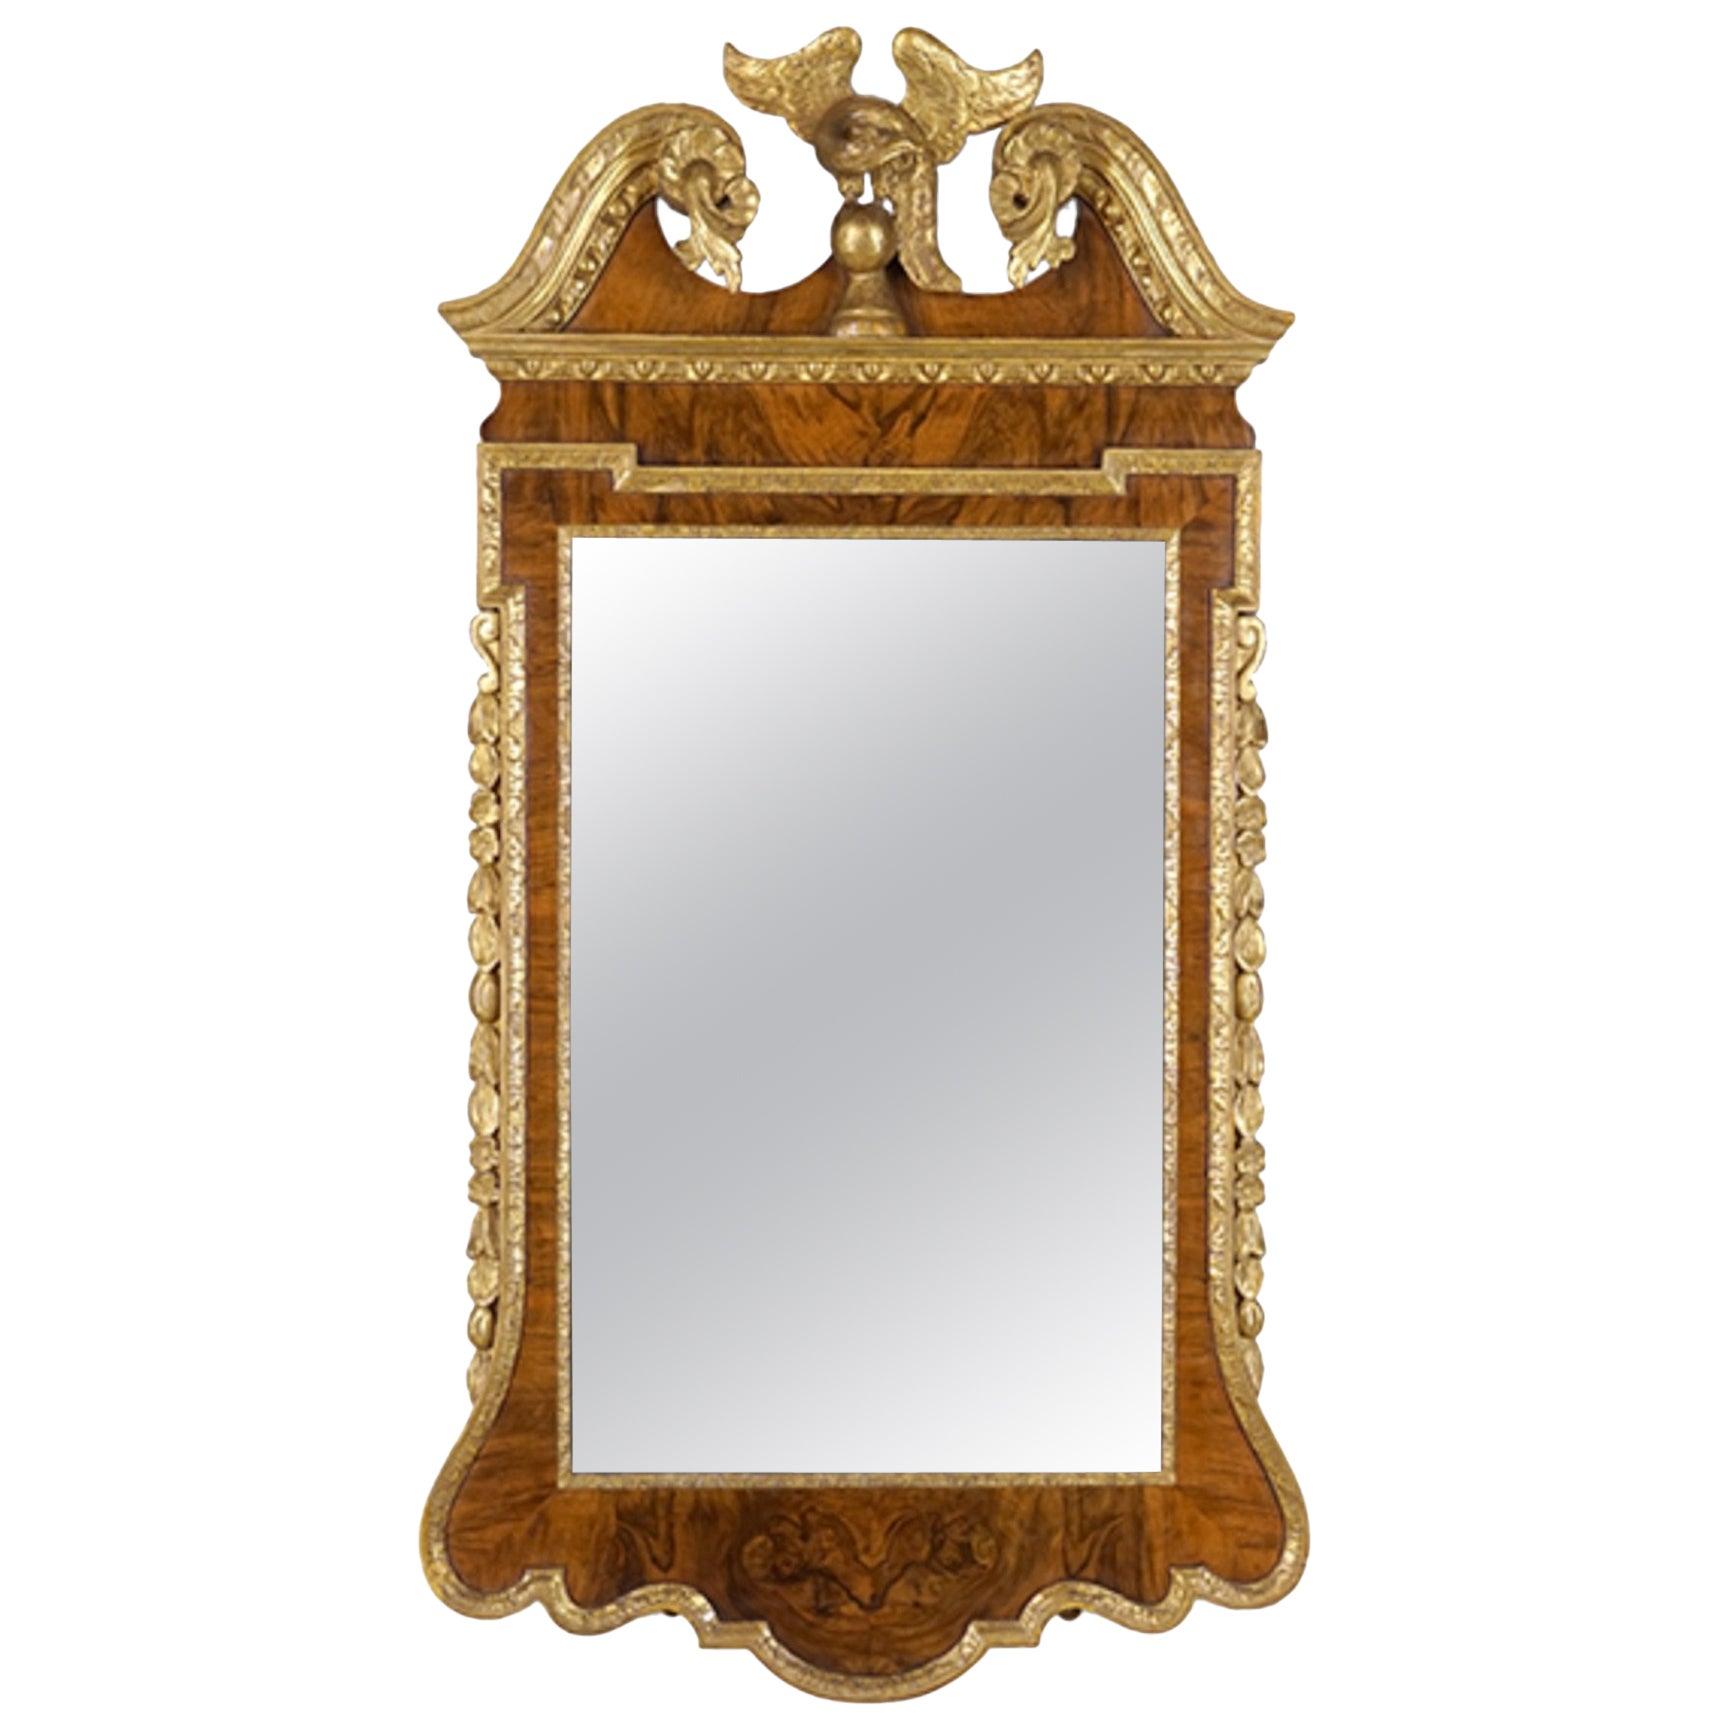 19th Century Geo III Style Mirror, Burled Walnut With Giltwood Decoration